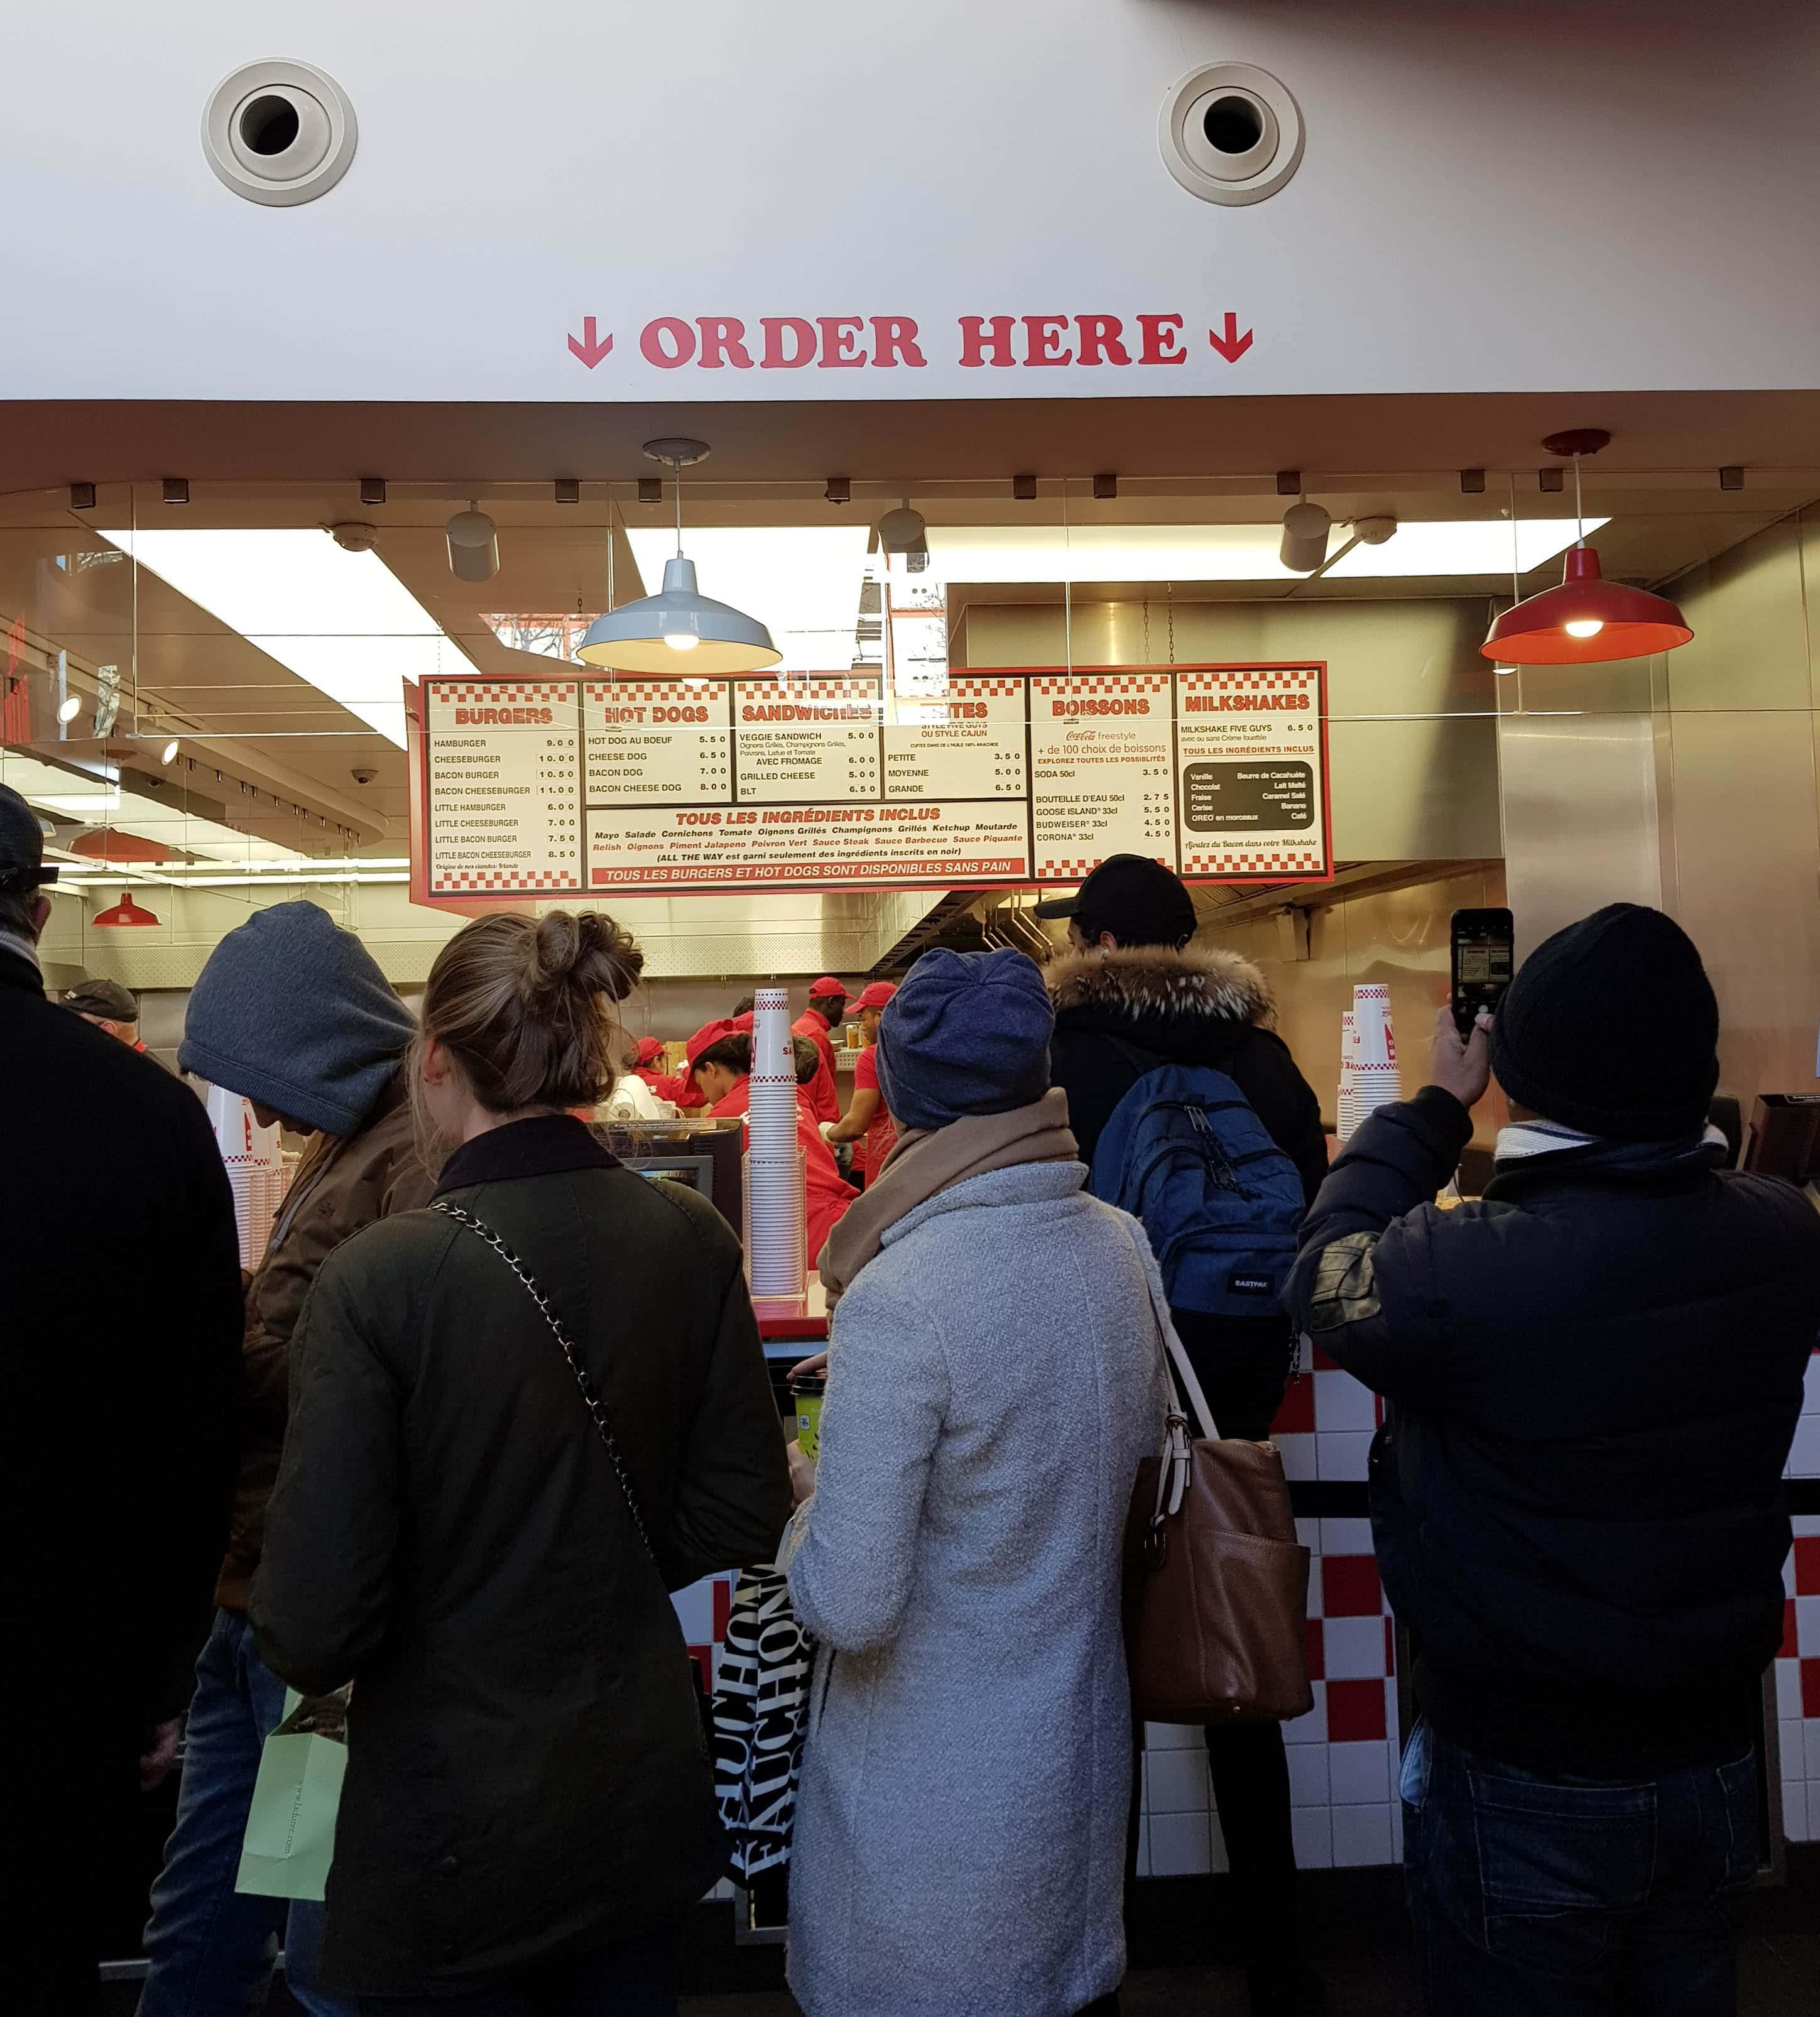 five guys fast food paris fidjigirl champs elysées